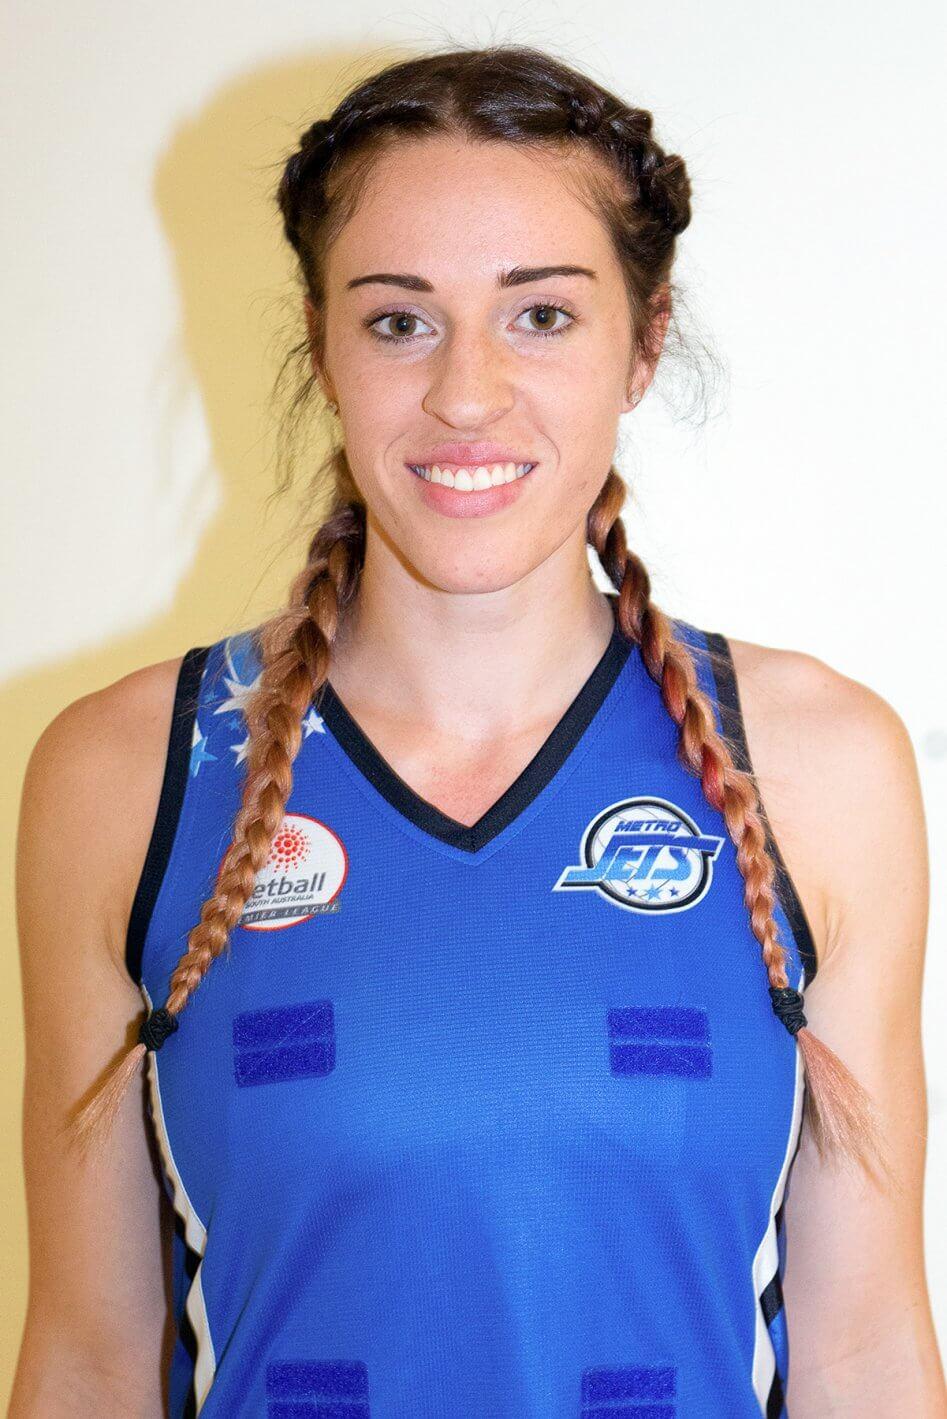 Alyse Taylor